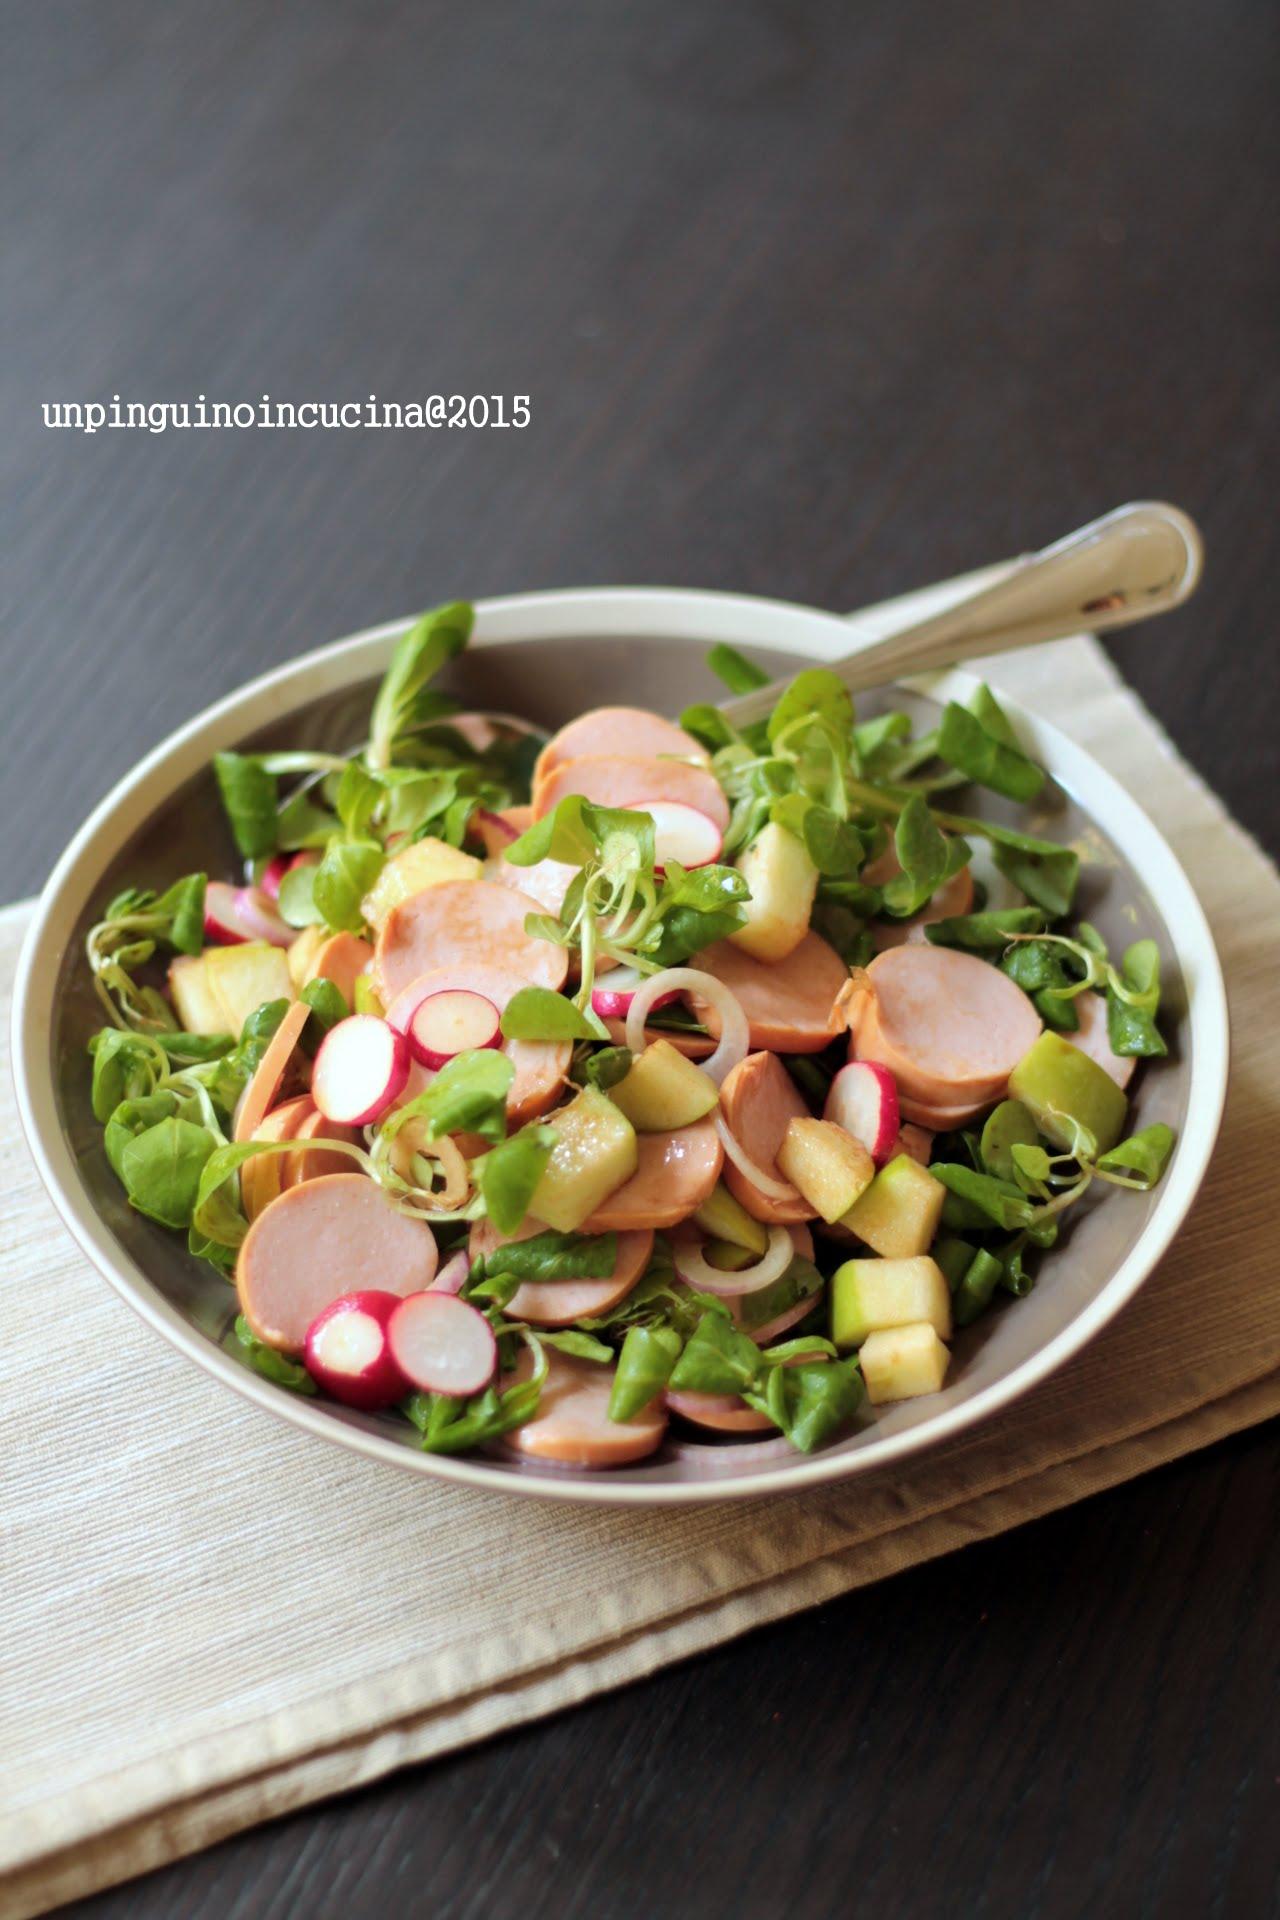 insalata-servelade-ravanelli-mela-e-cipollotto